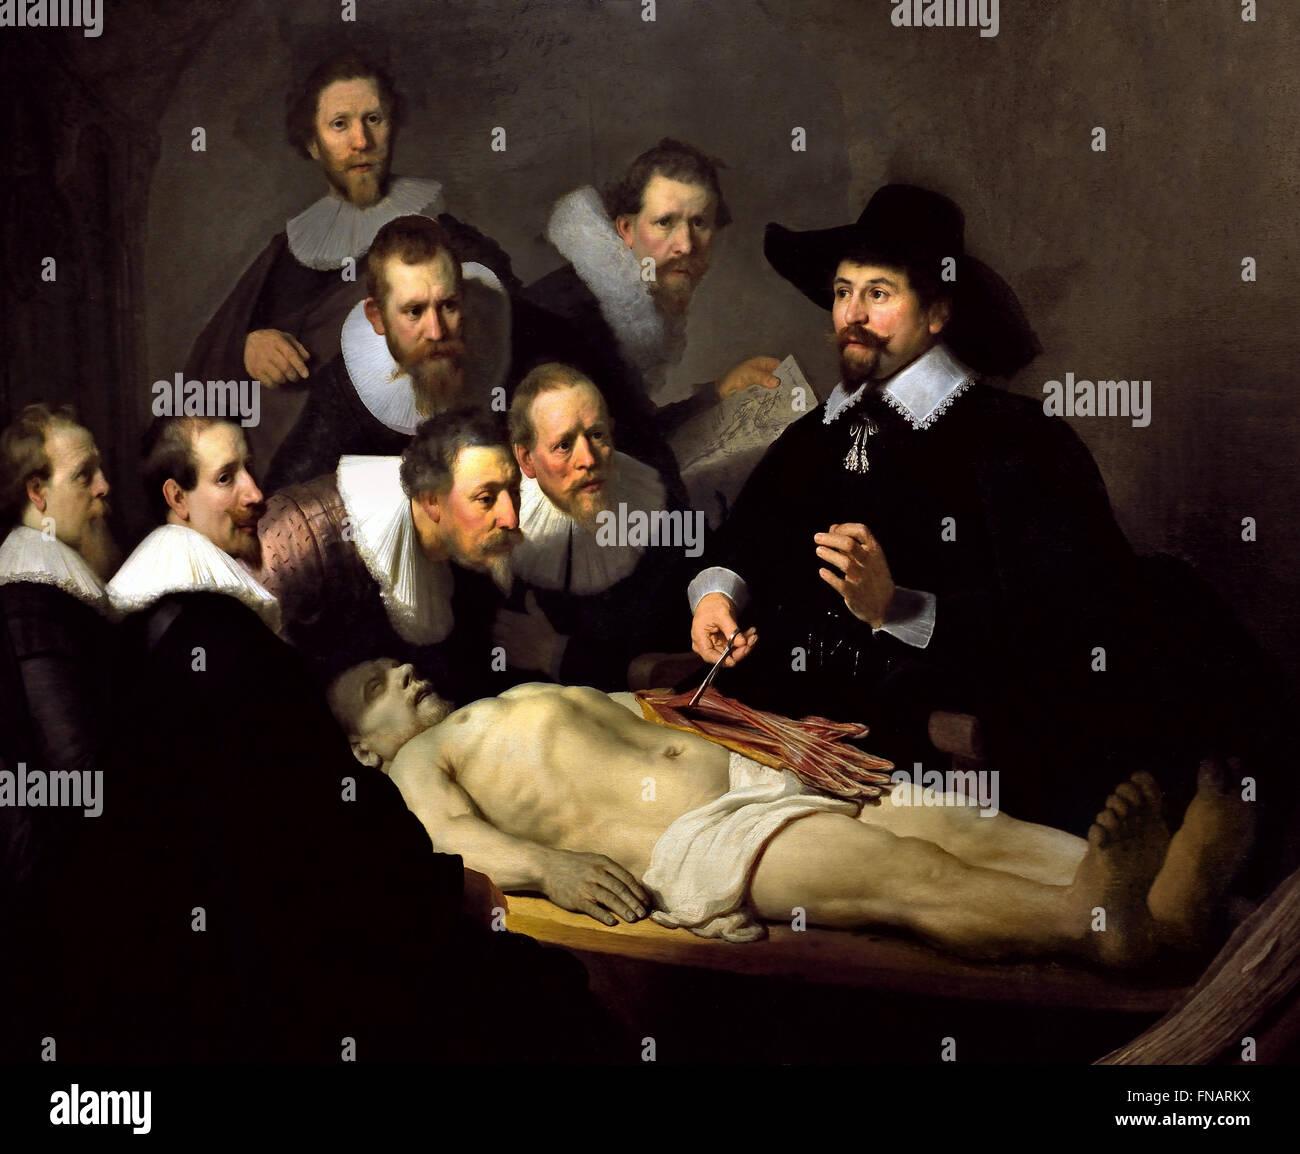 The Anatomy Lesson ( de anatomische les ) of Dr Nicolaes Tulp 1632 ...